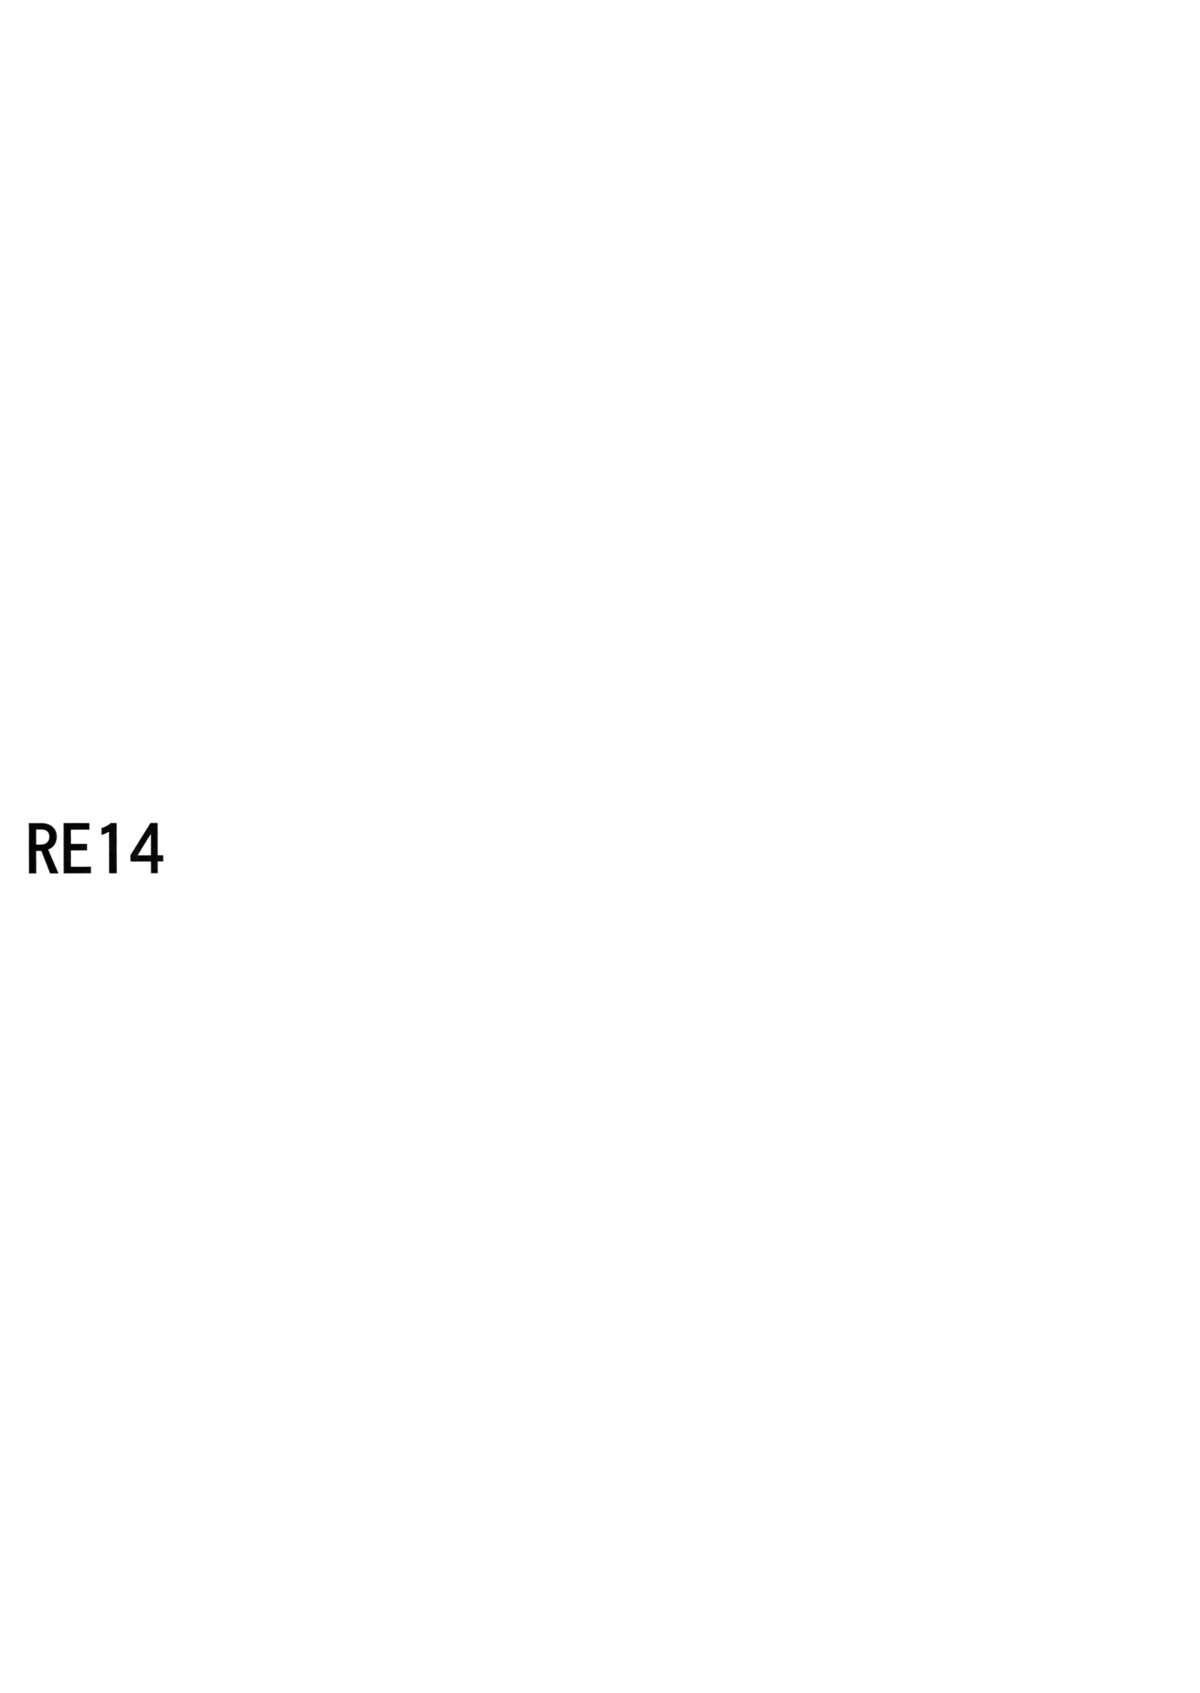 RE 14 27